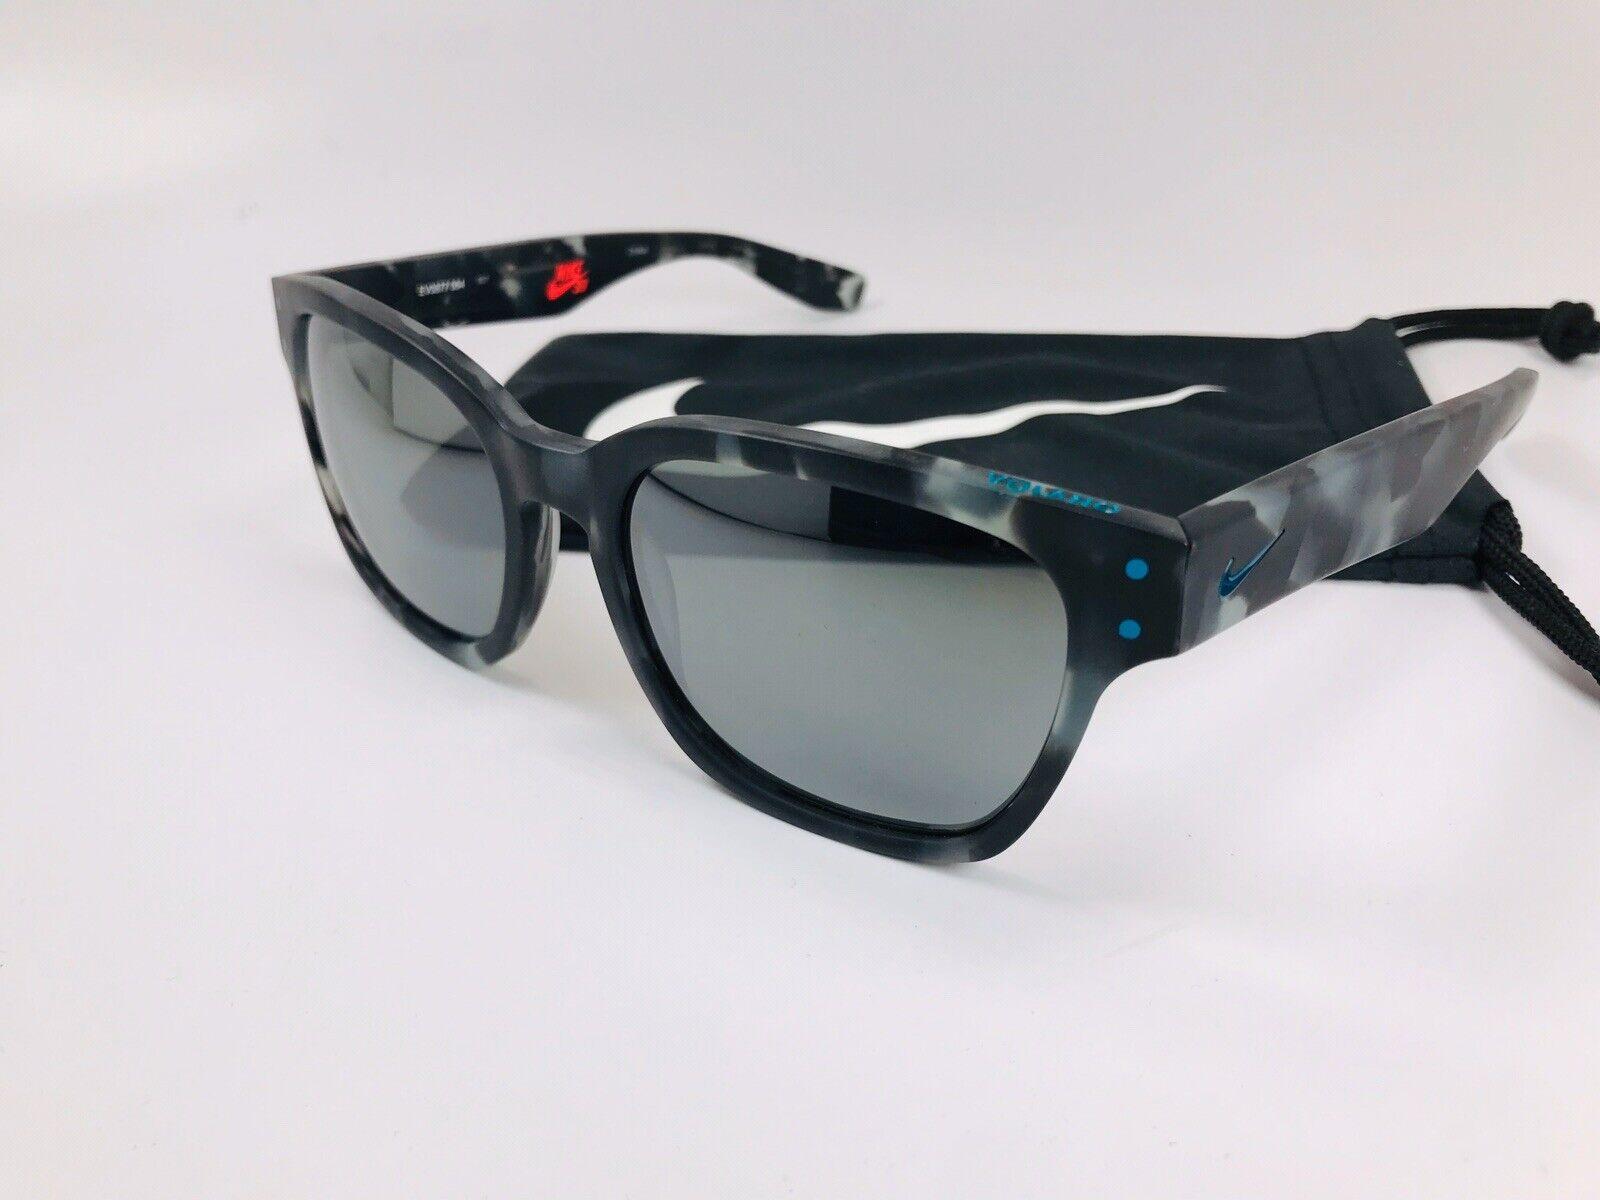 Desventaja auditoría Escupir  Nike Volano Ev0877 Sunglasses 064 MT Grey Tort 100 Authentic for sale  online | eBay